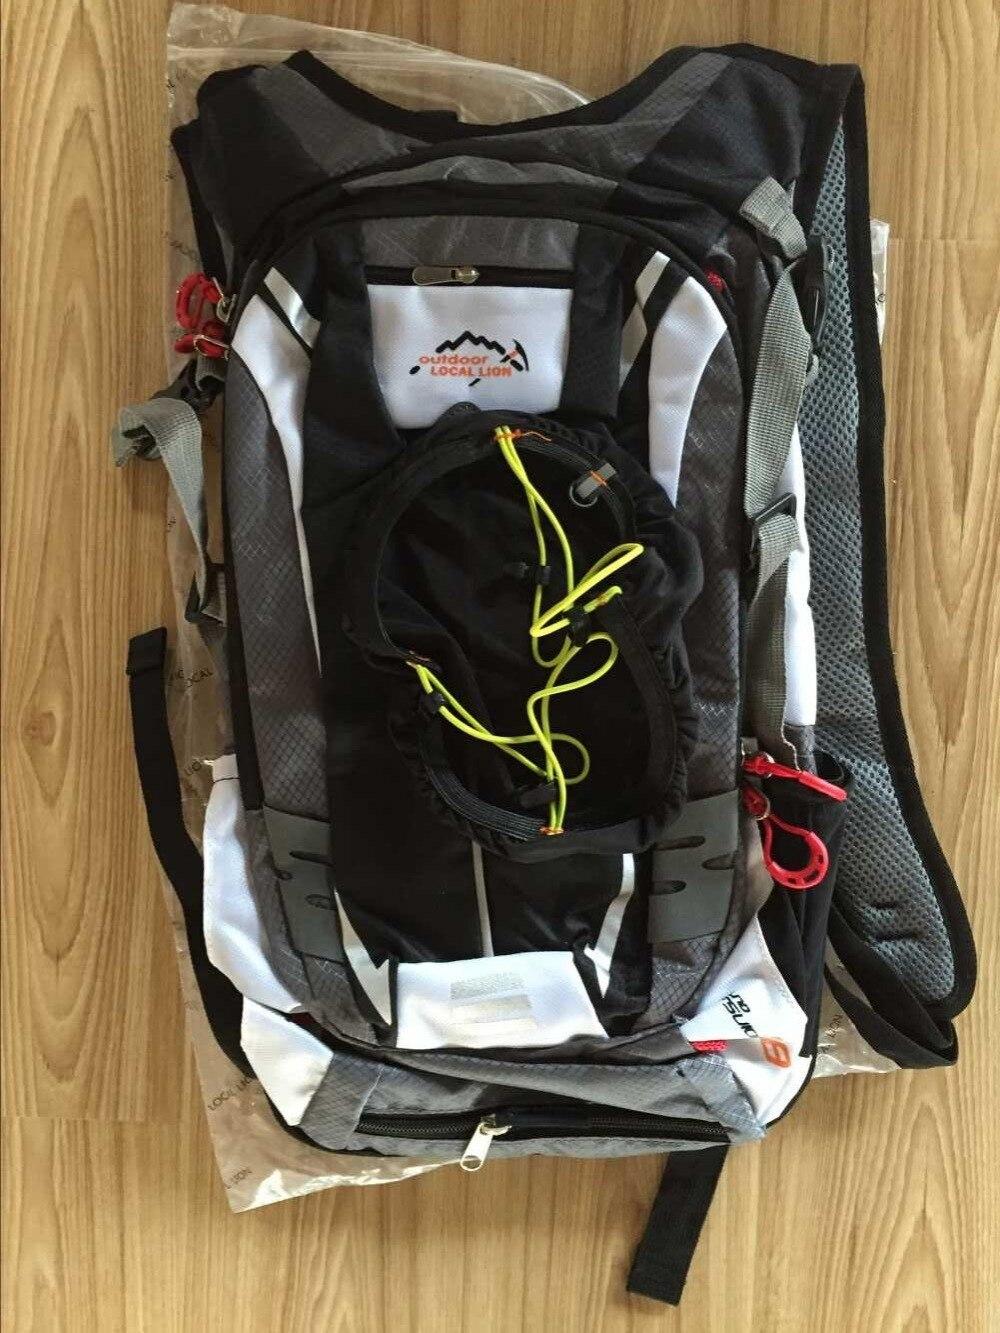 18L Fashion Backpack Hydration Pack Rucksack Waterproof Bicycle Road Bag Knapsack Daypack School Bags Mochila sac a dos 464